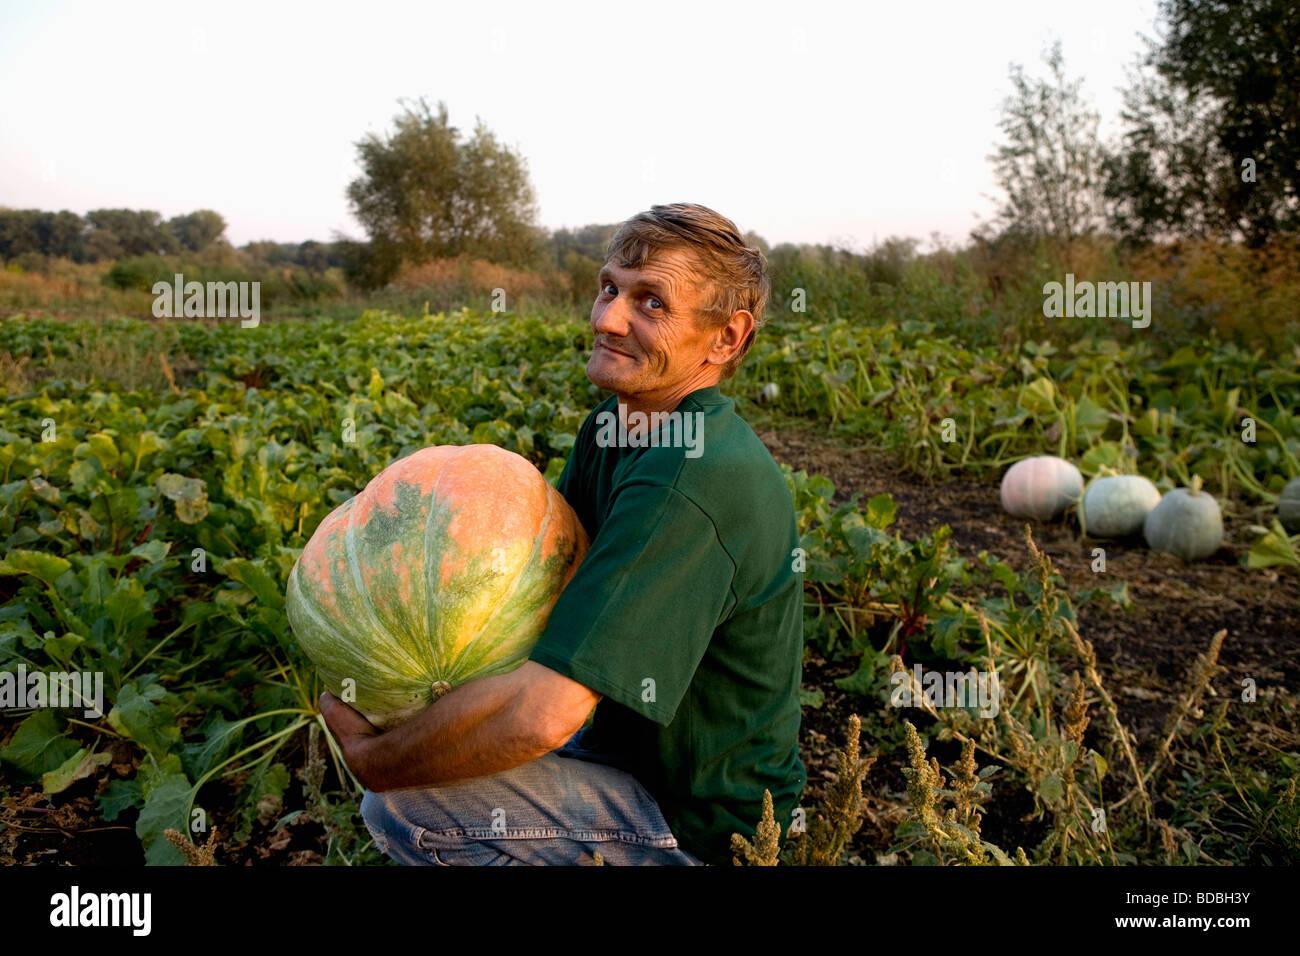 Portrait de paysan assis dans garden holding pumpkin Photo Stock